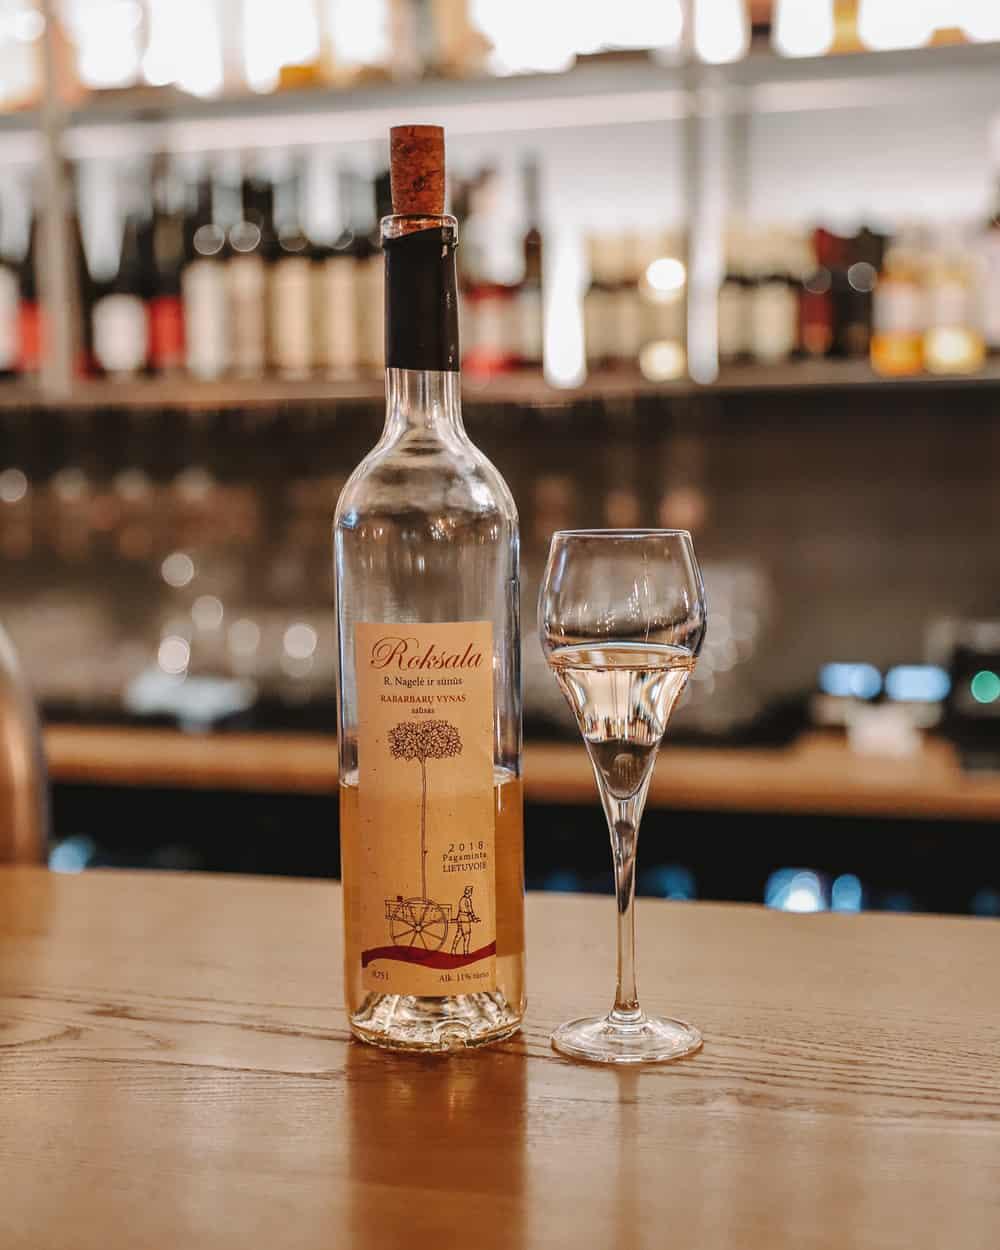 Rhubarb Wine in Vilnius